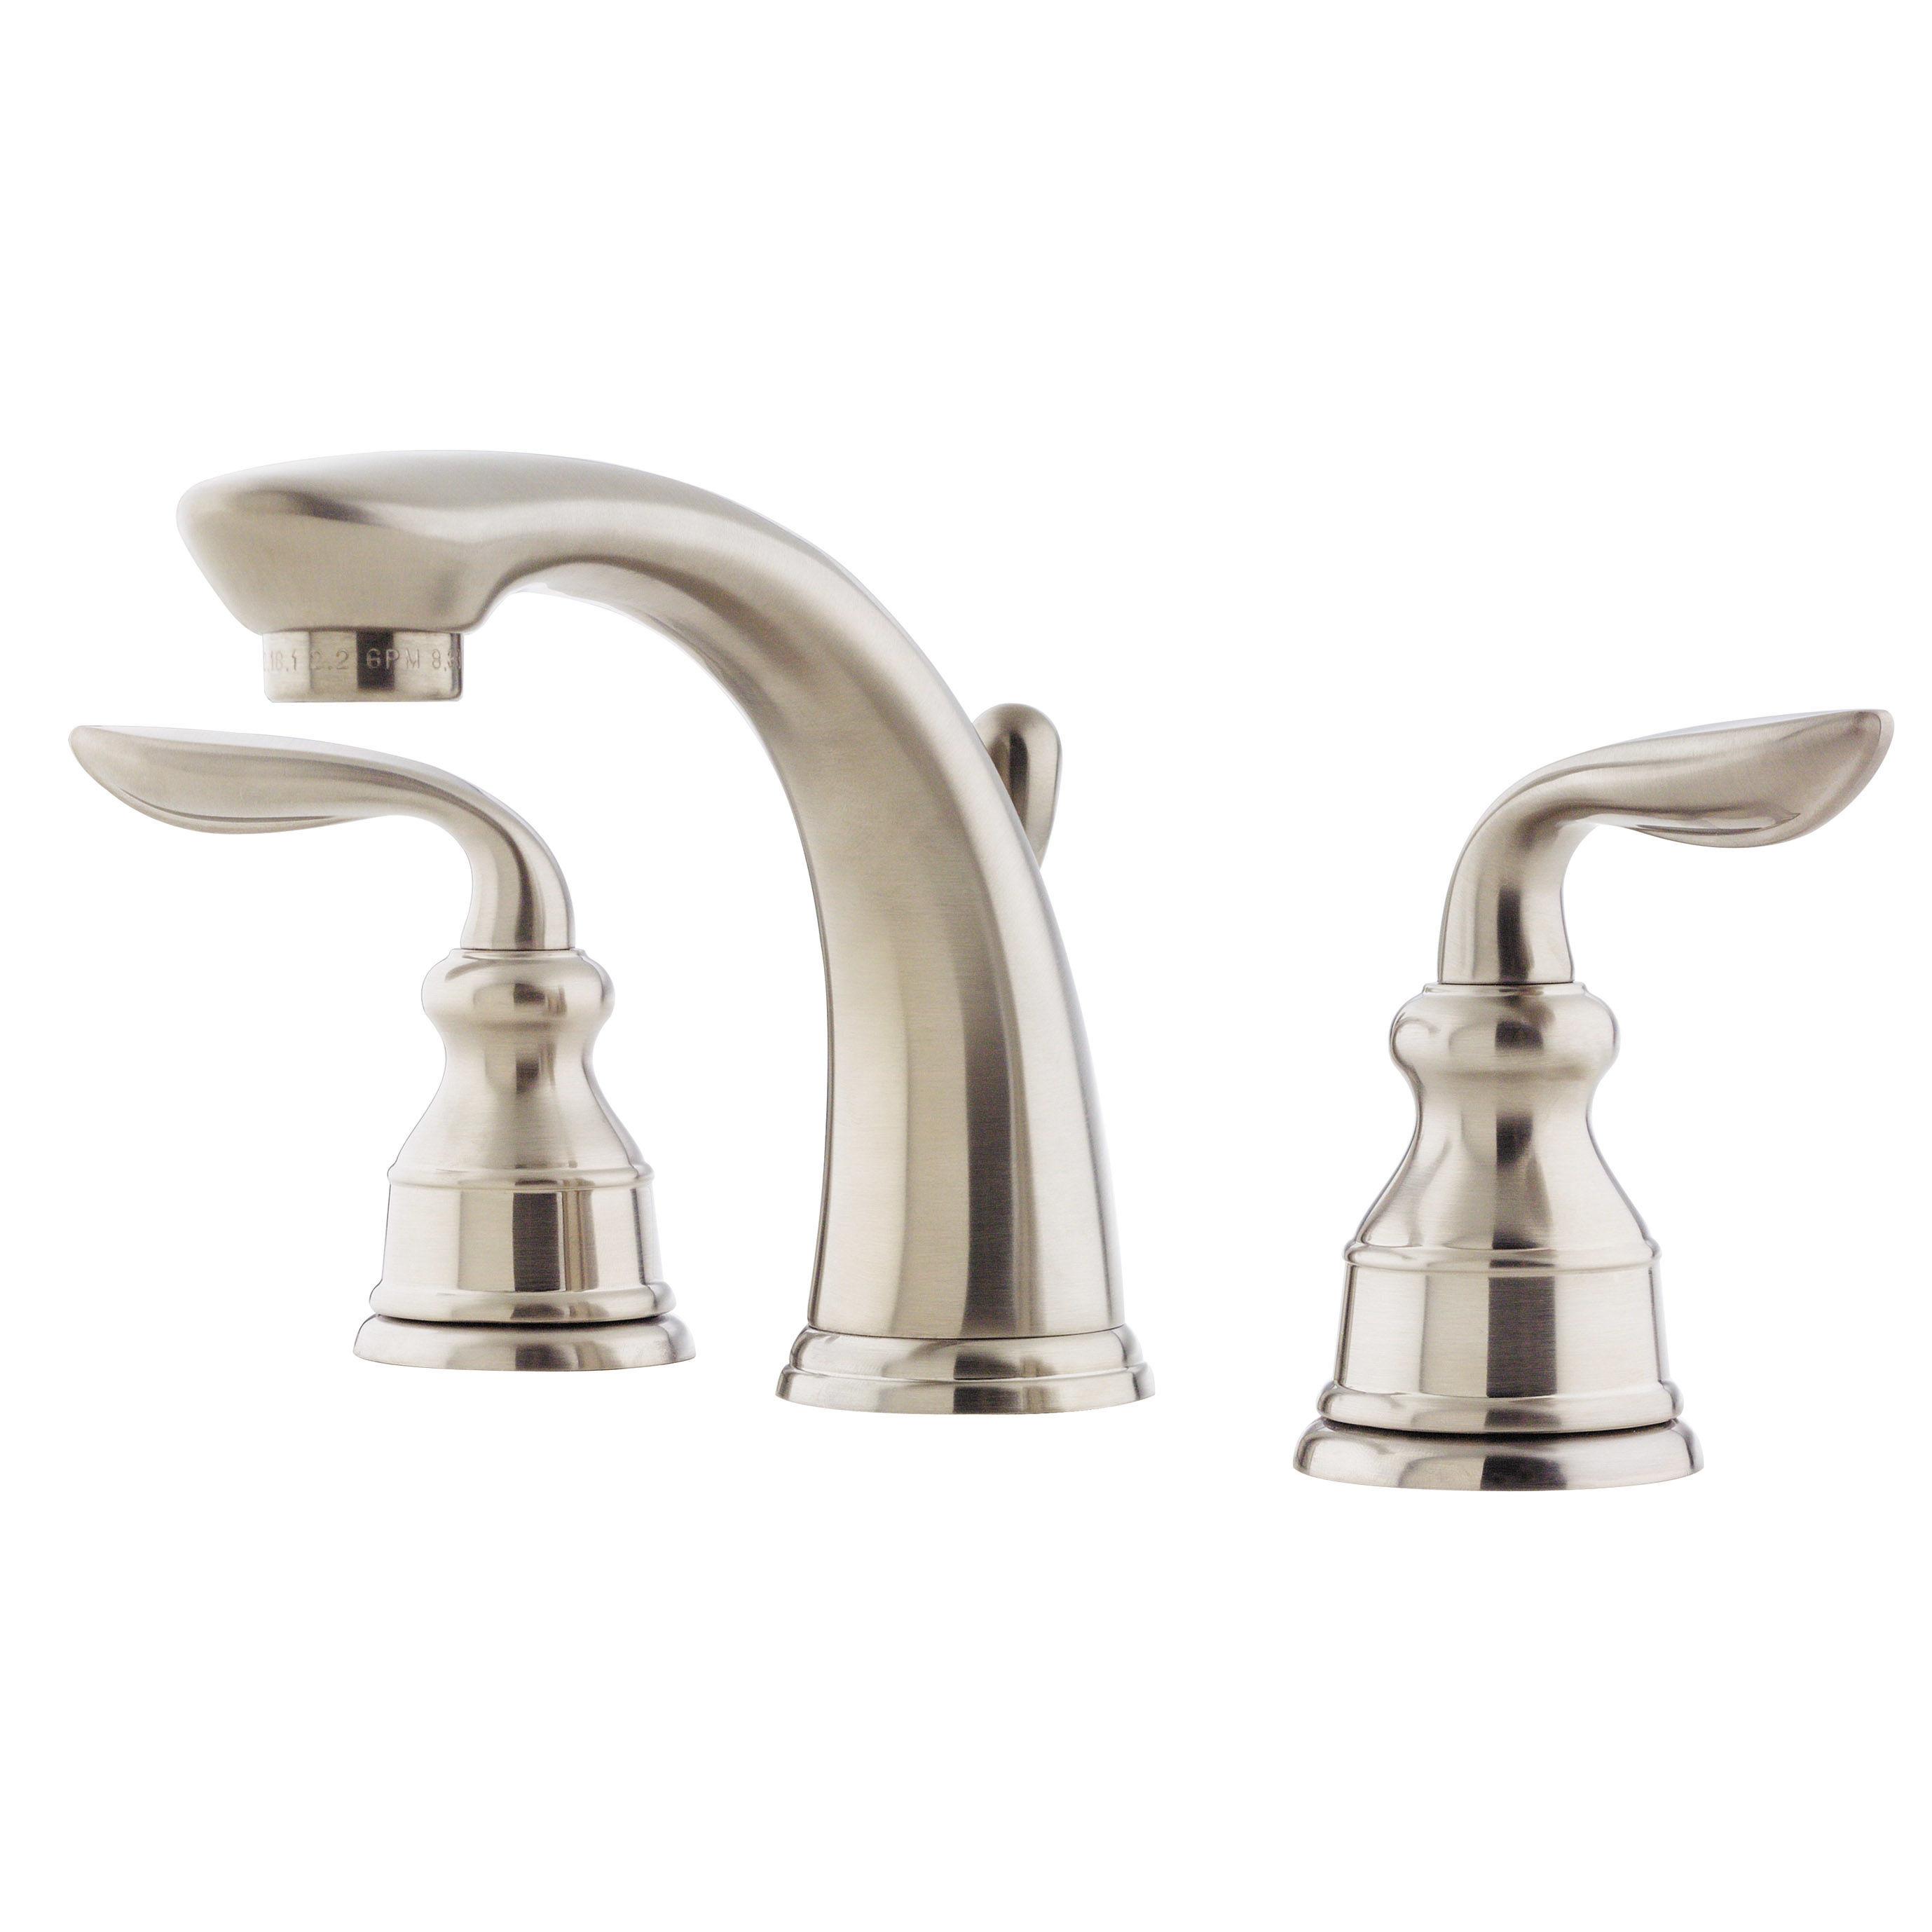 Pfister GT49-CB0K Brushed Nickel Avalon Widespread Bathroom Faucet ...